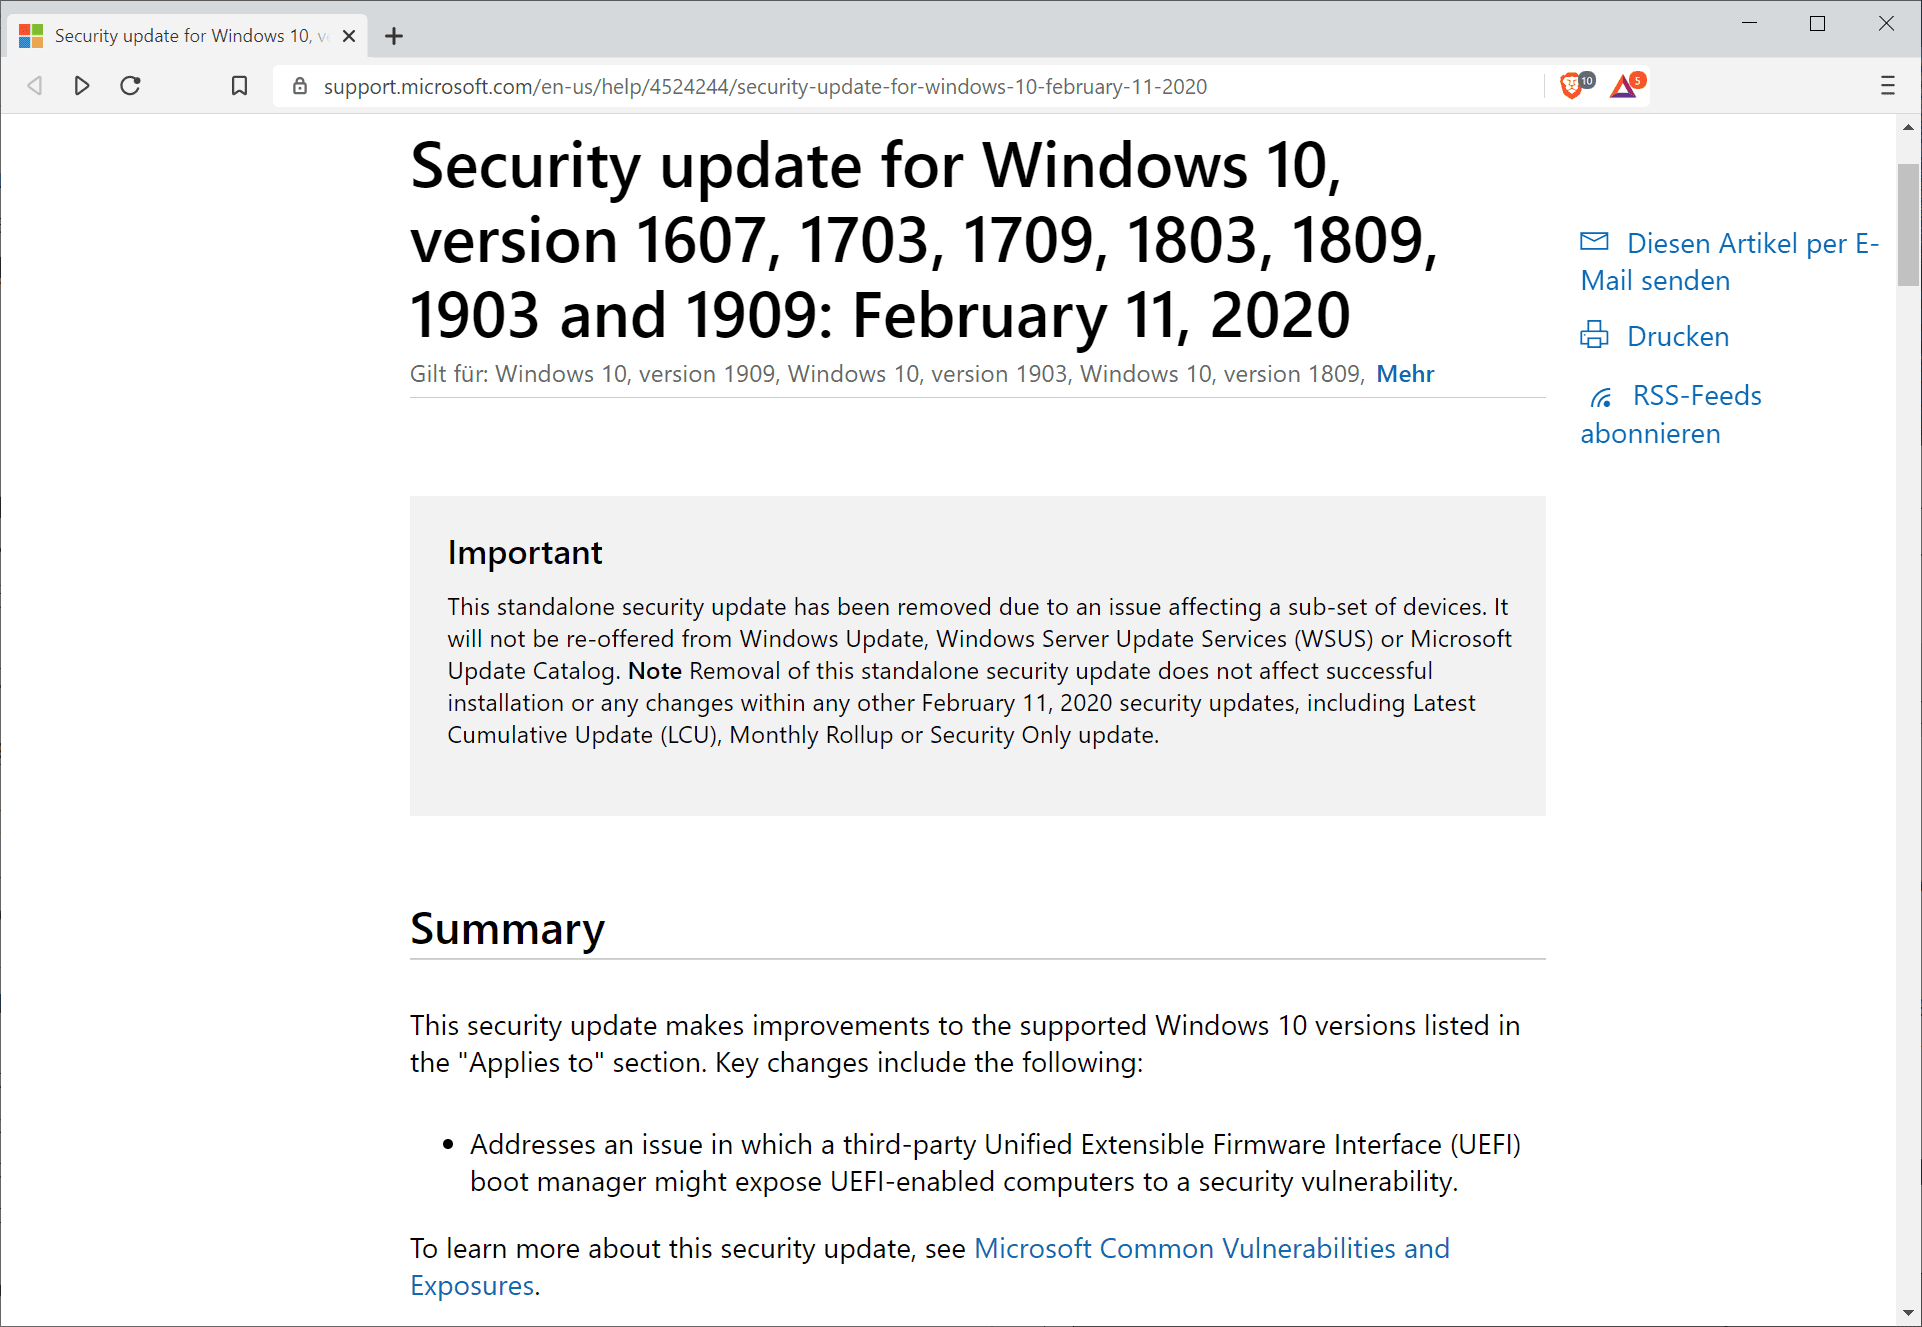 microsoft saca KB4524244 windows 10